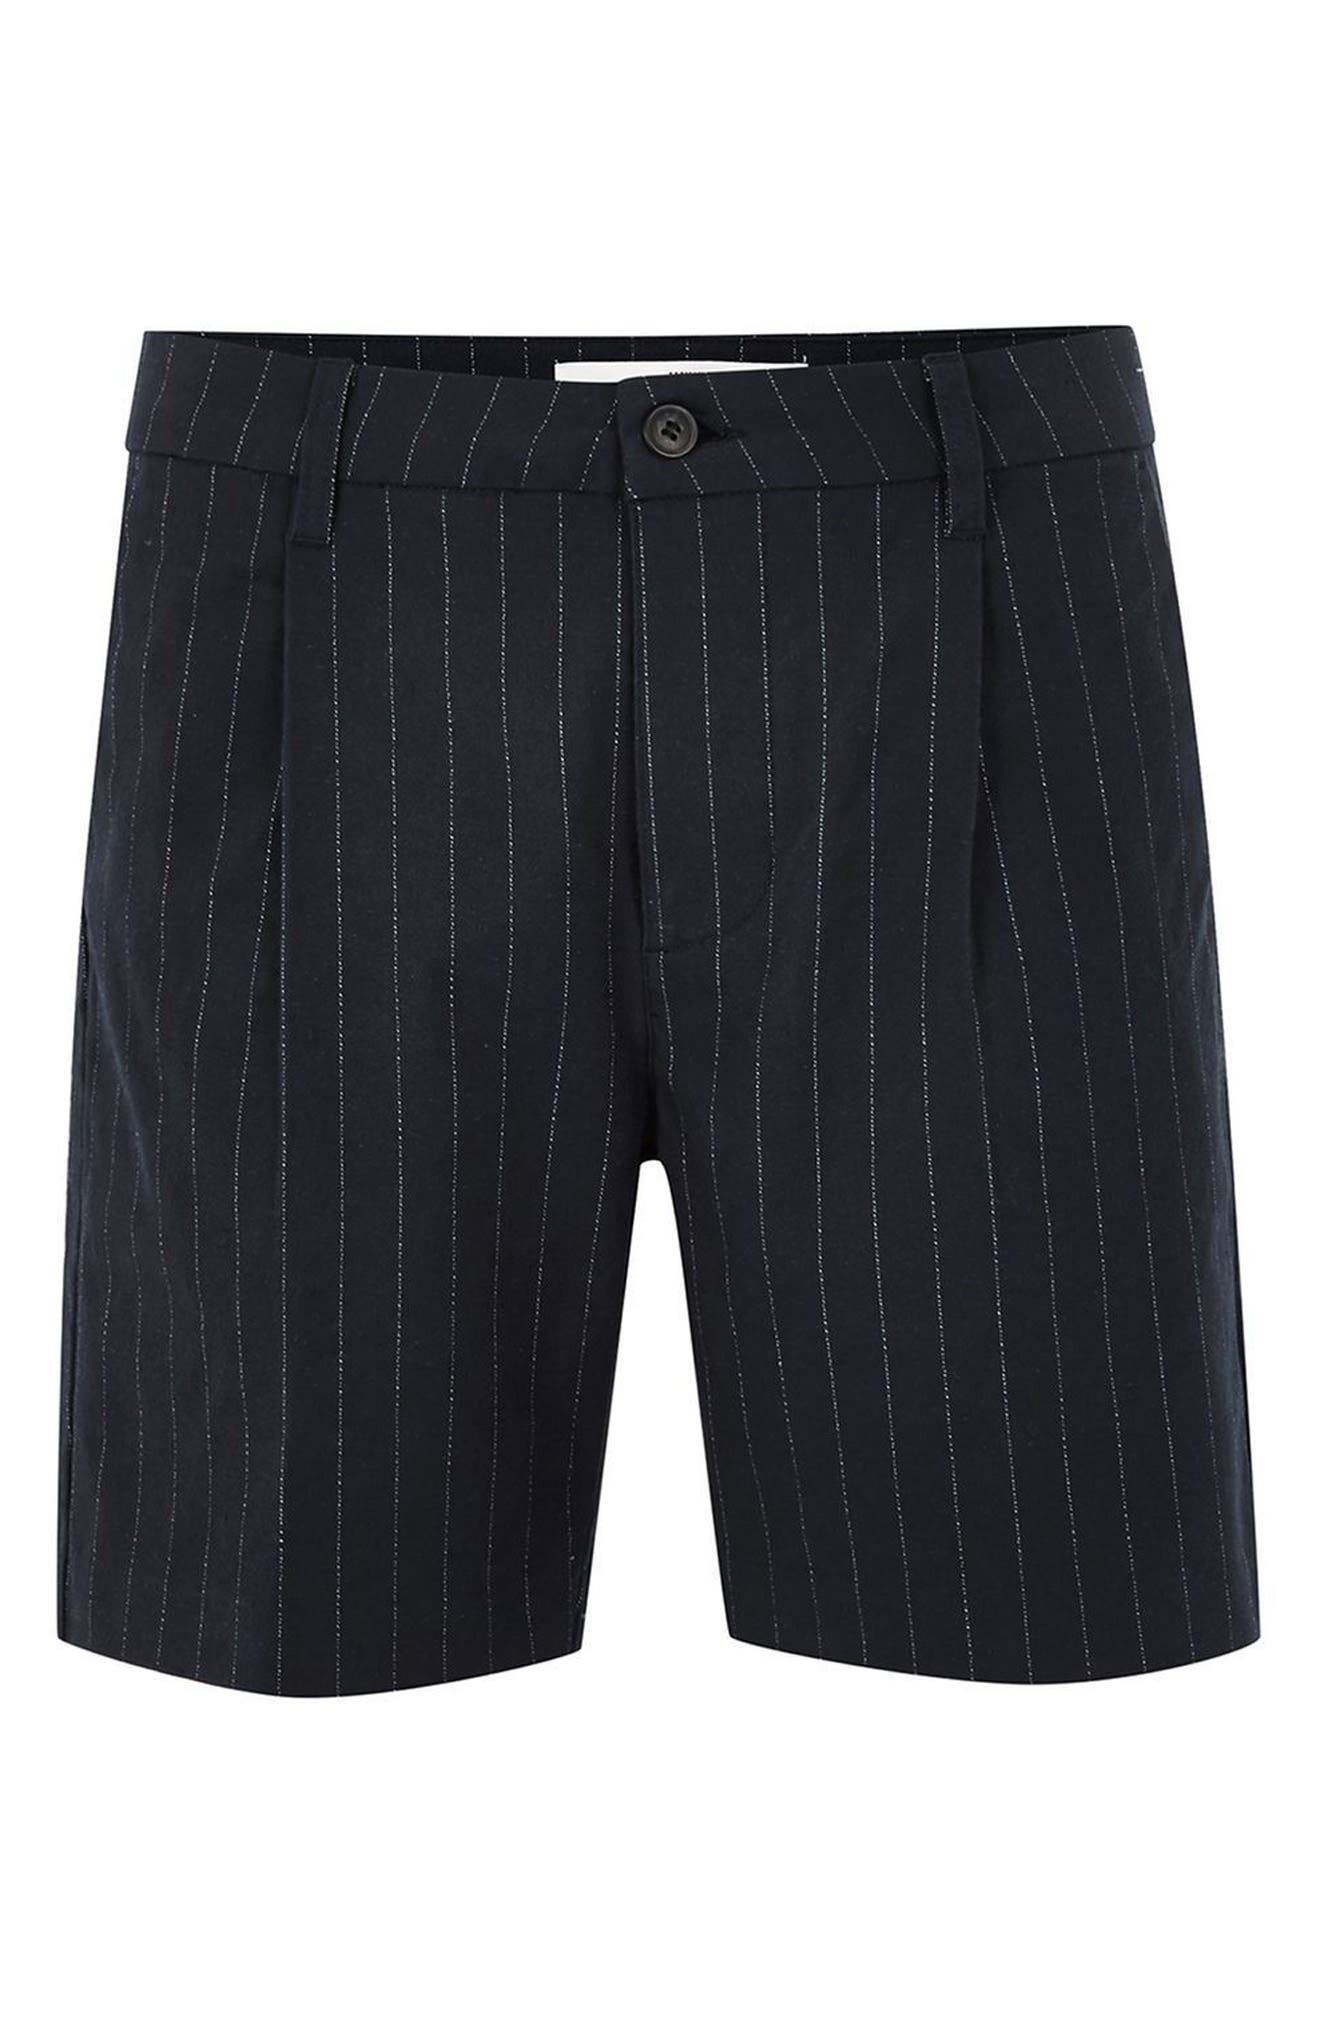 Pinstripe Shorts,                             Alternate thumbnail 2, color,                             411